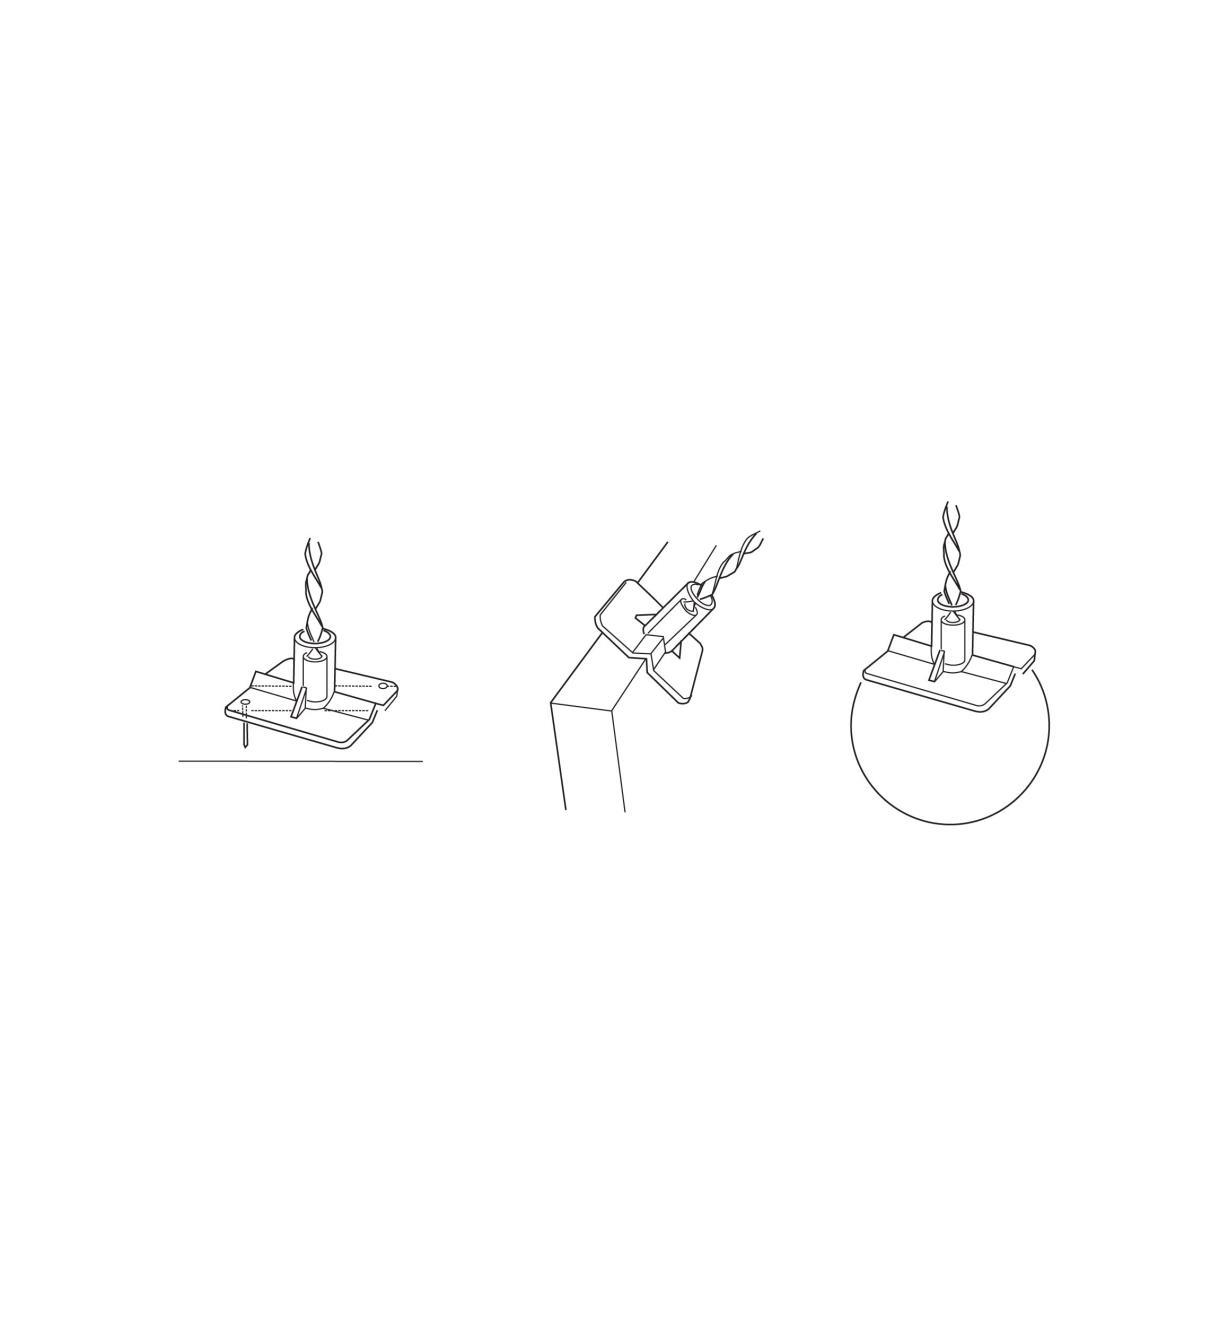 50J4001 - Versatile Drill Guide